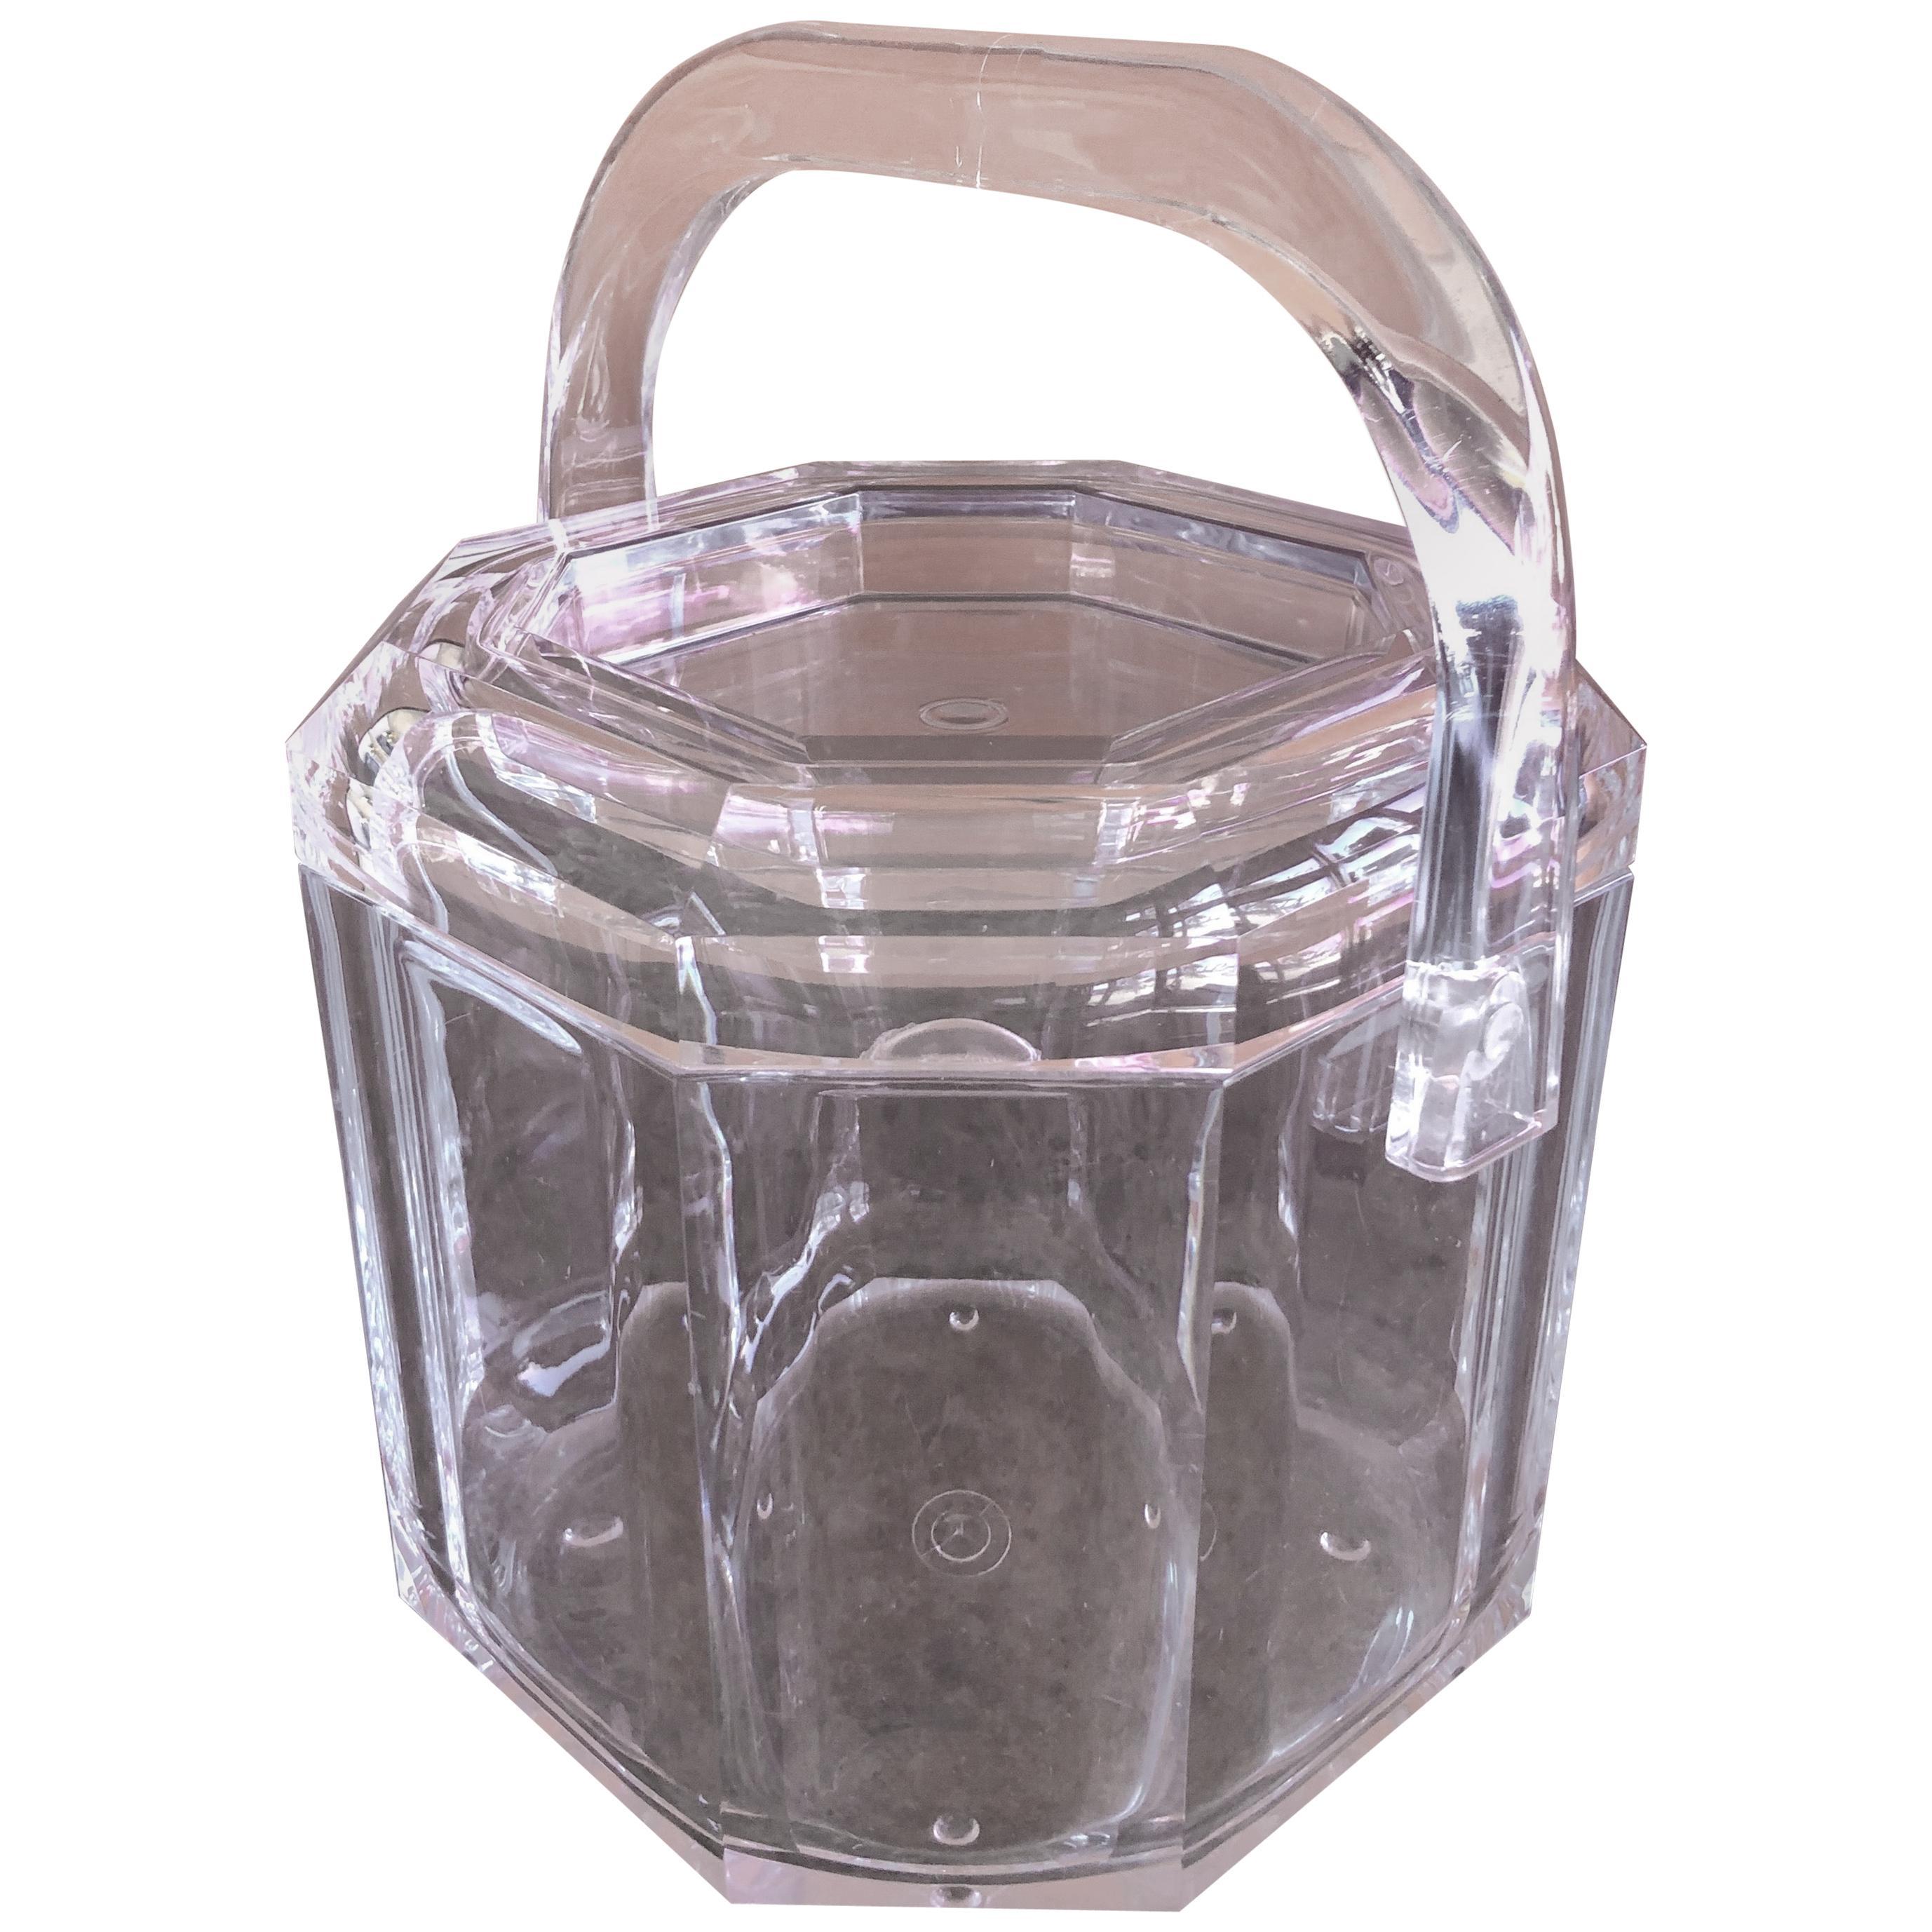 Mid-Century Modern Lucite Ice Bucket with Handle